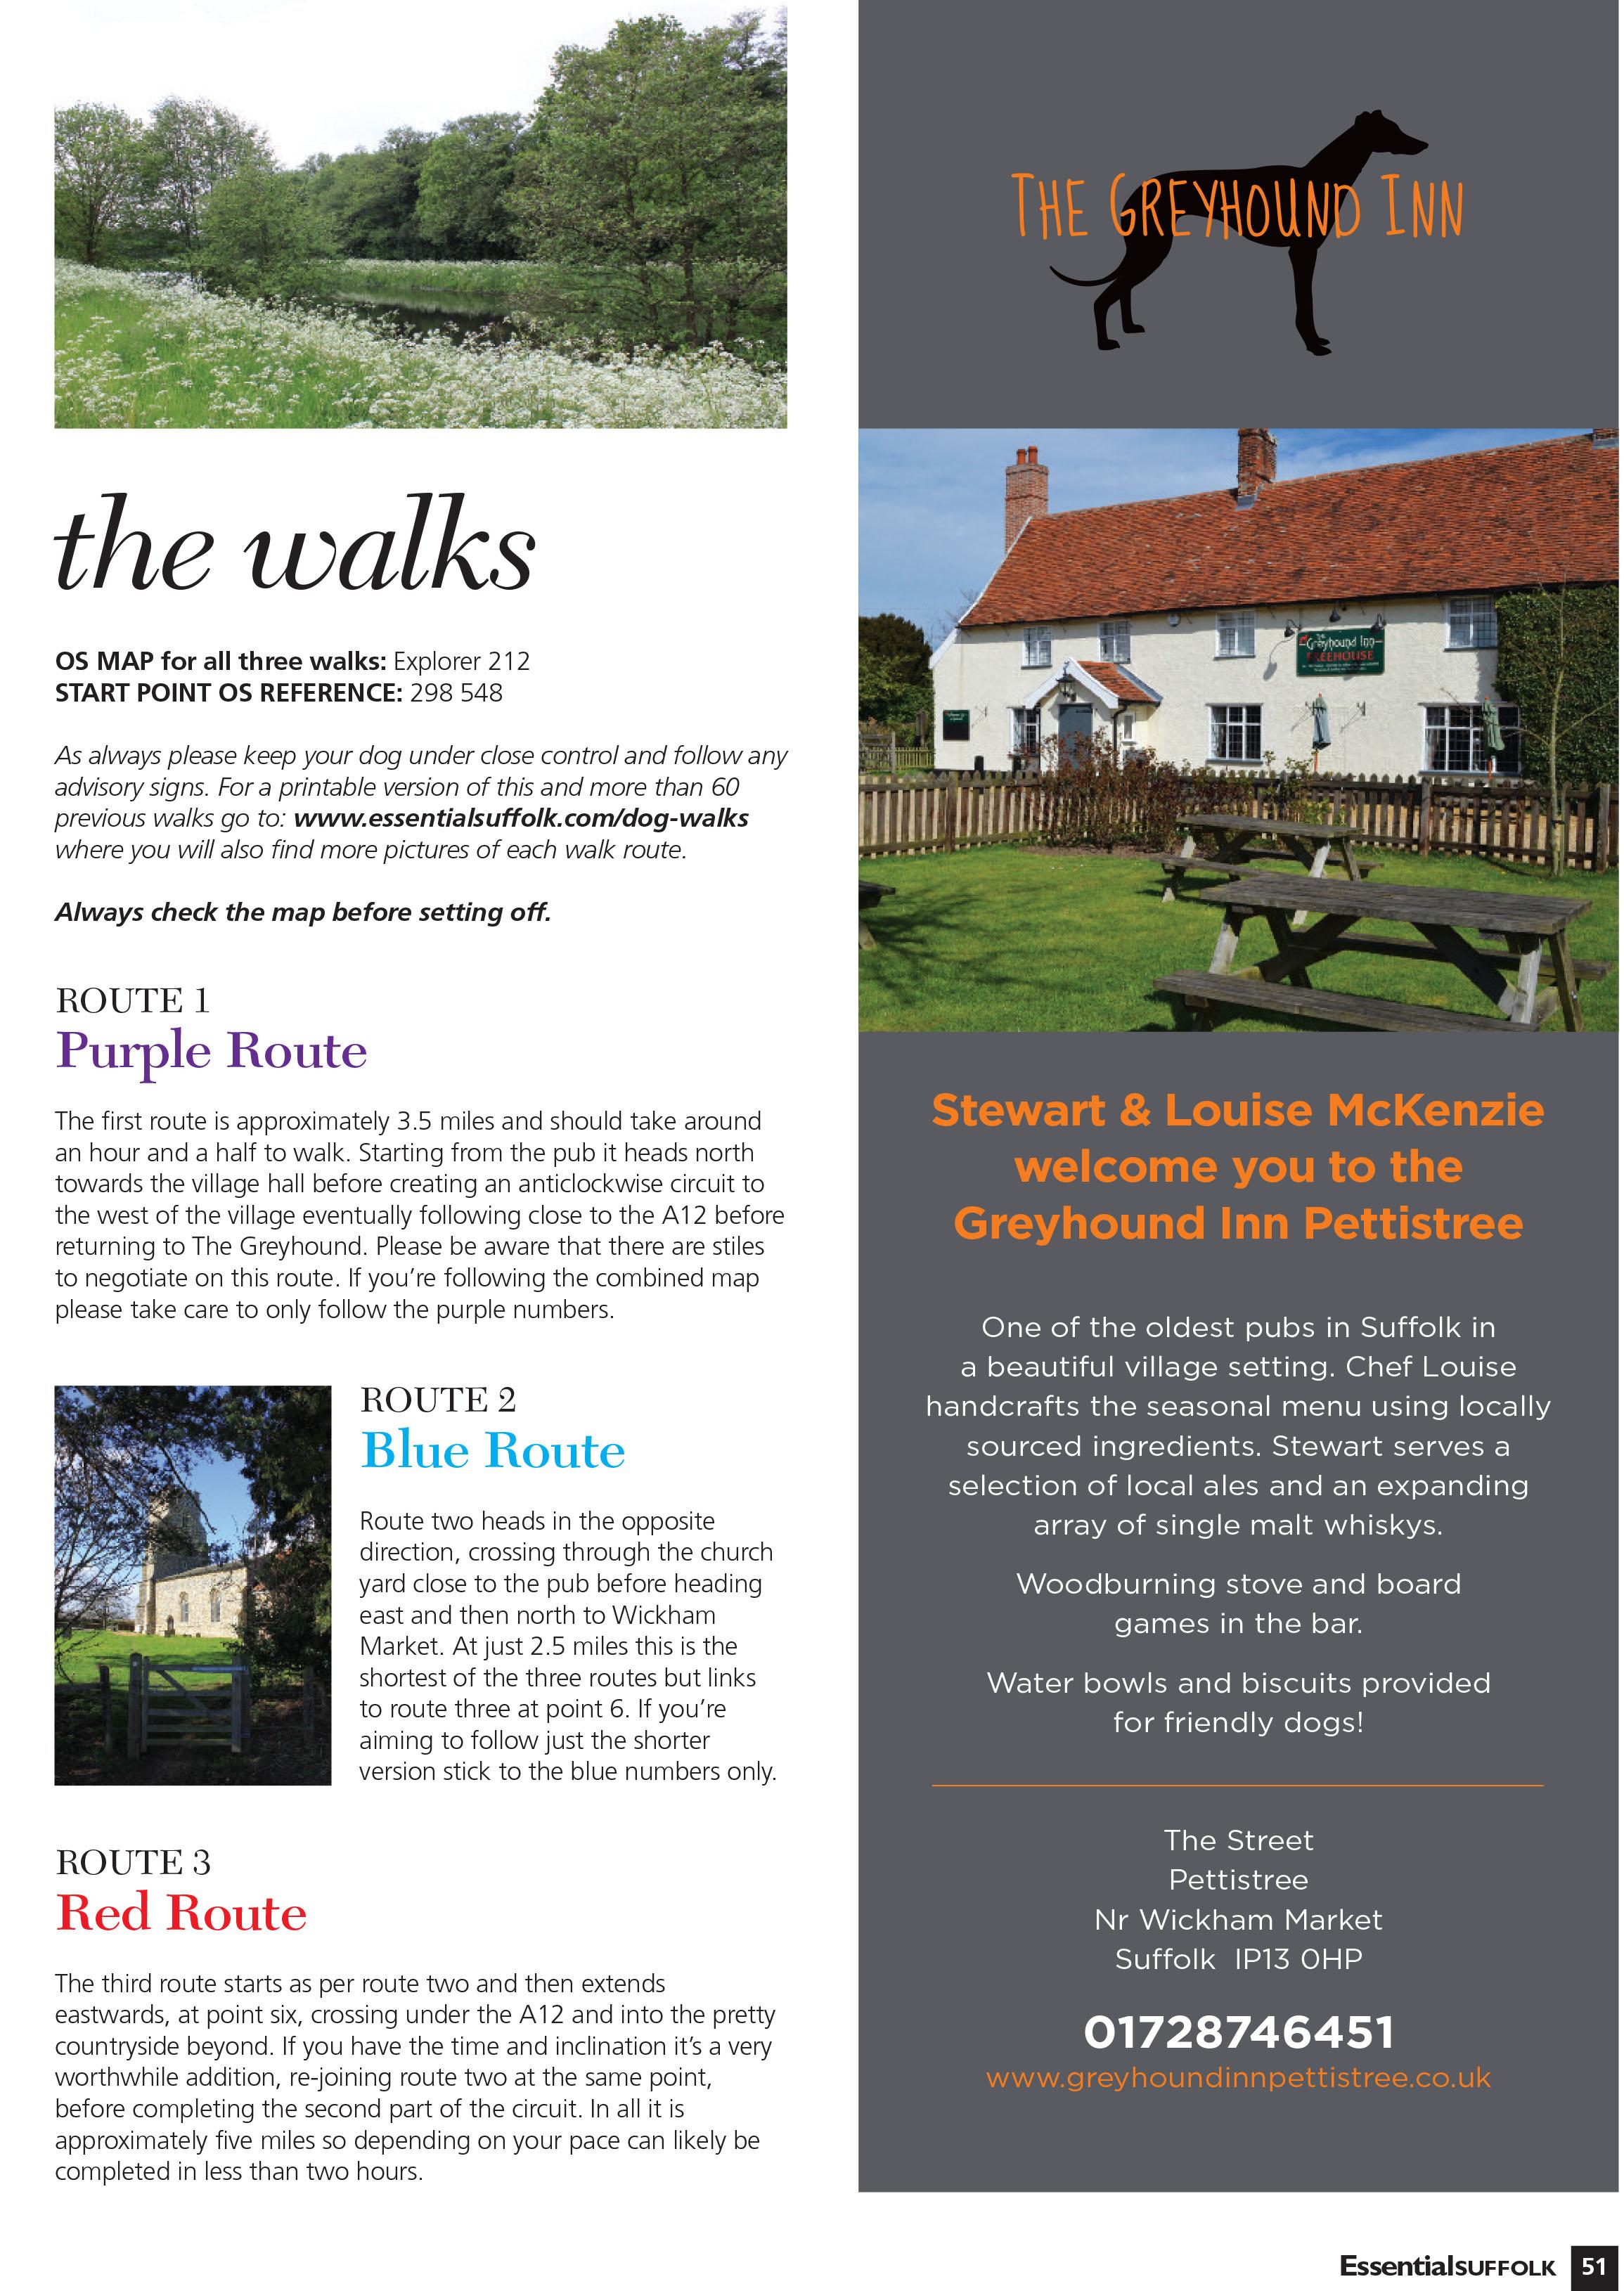 Essential Suffolk Pettistree dog walks page 2